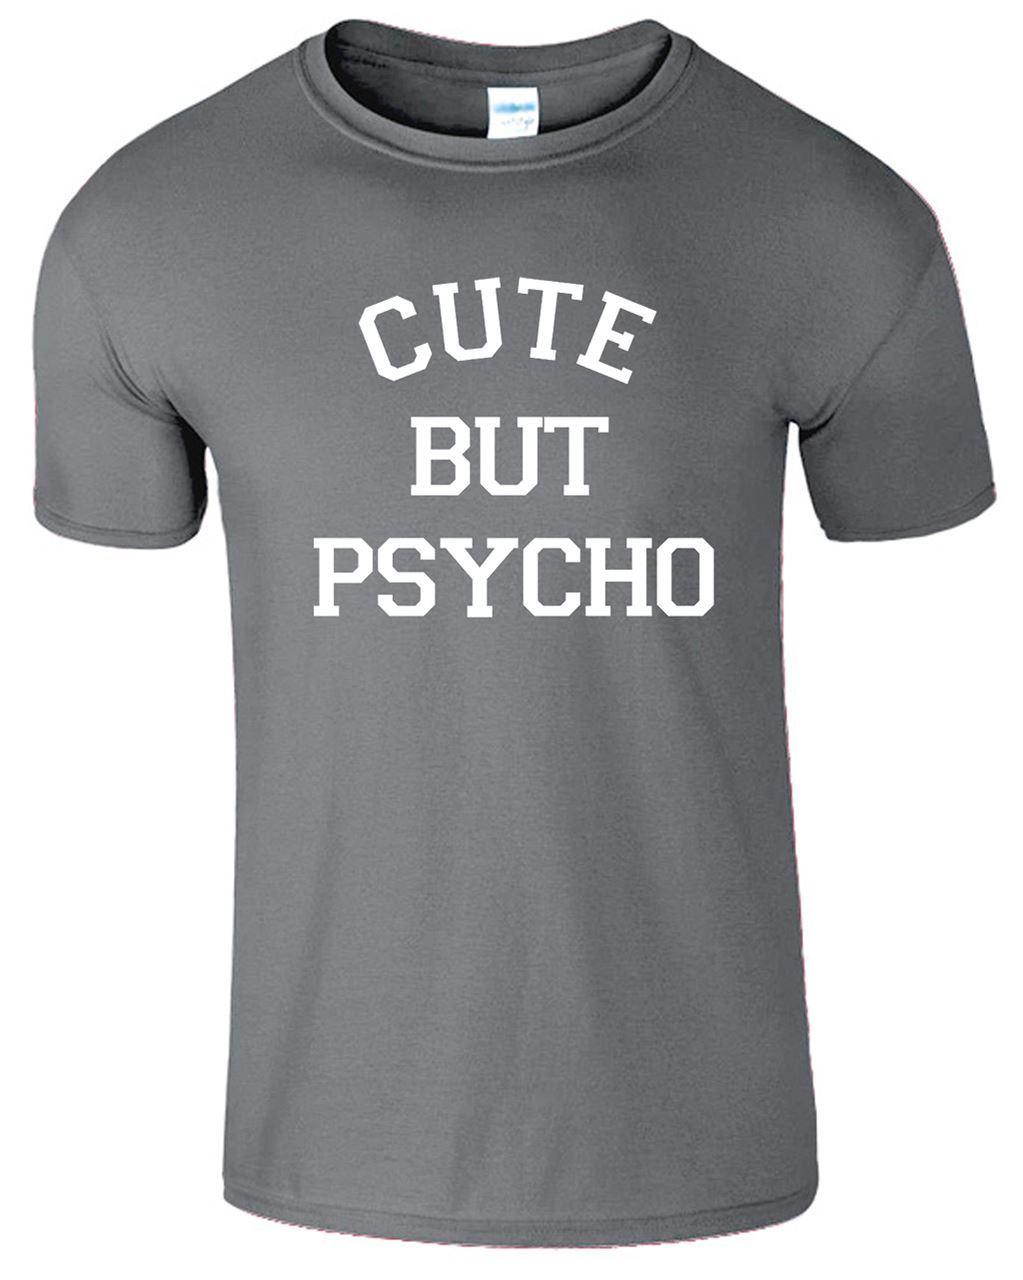 Shirt design new look - New Look Cute But Psycho Mens T Shirts